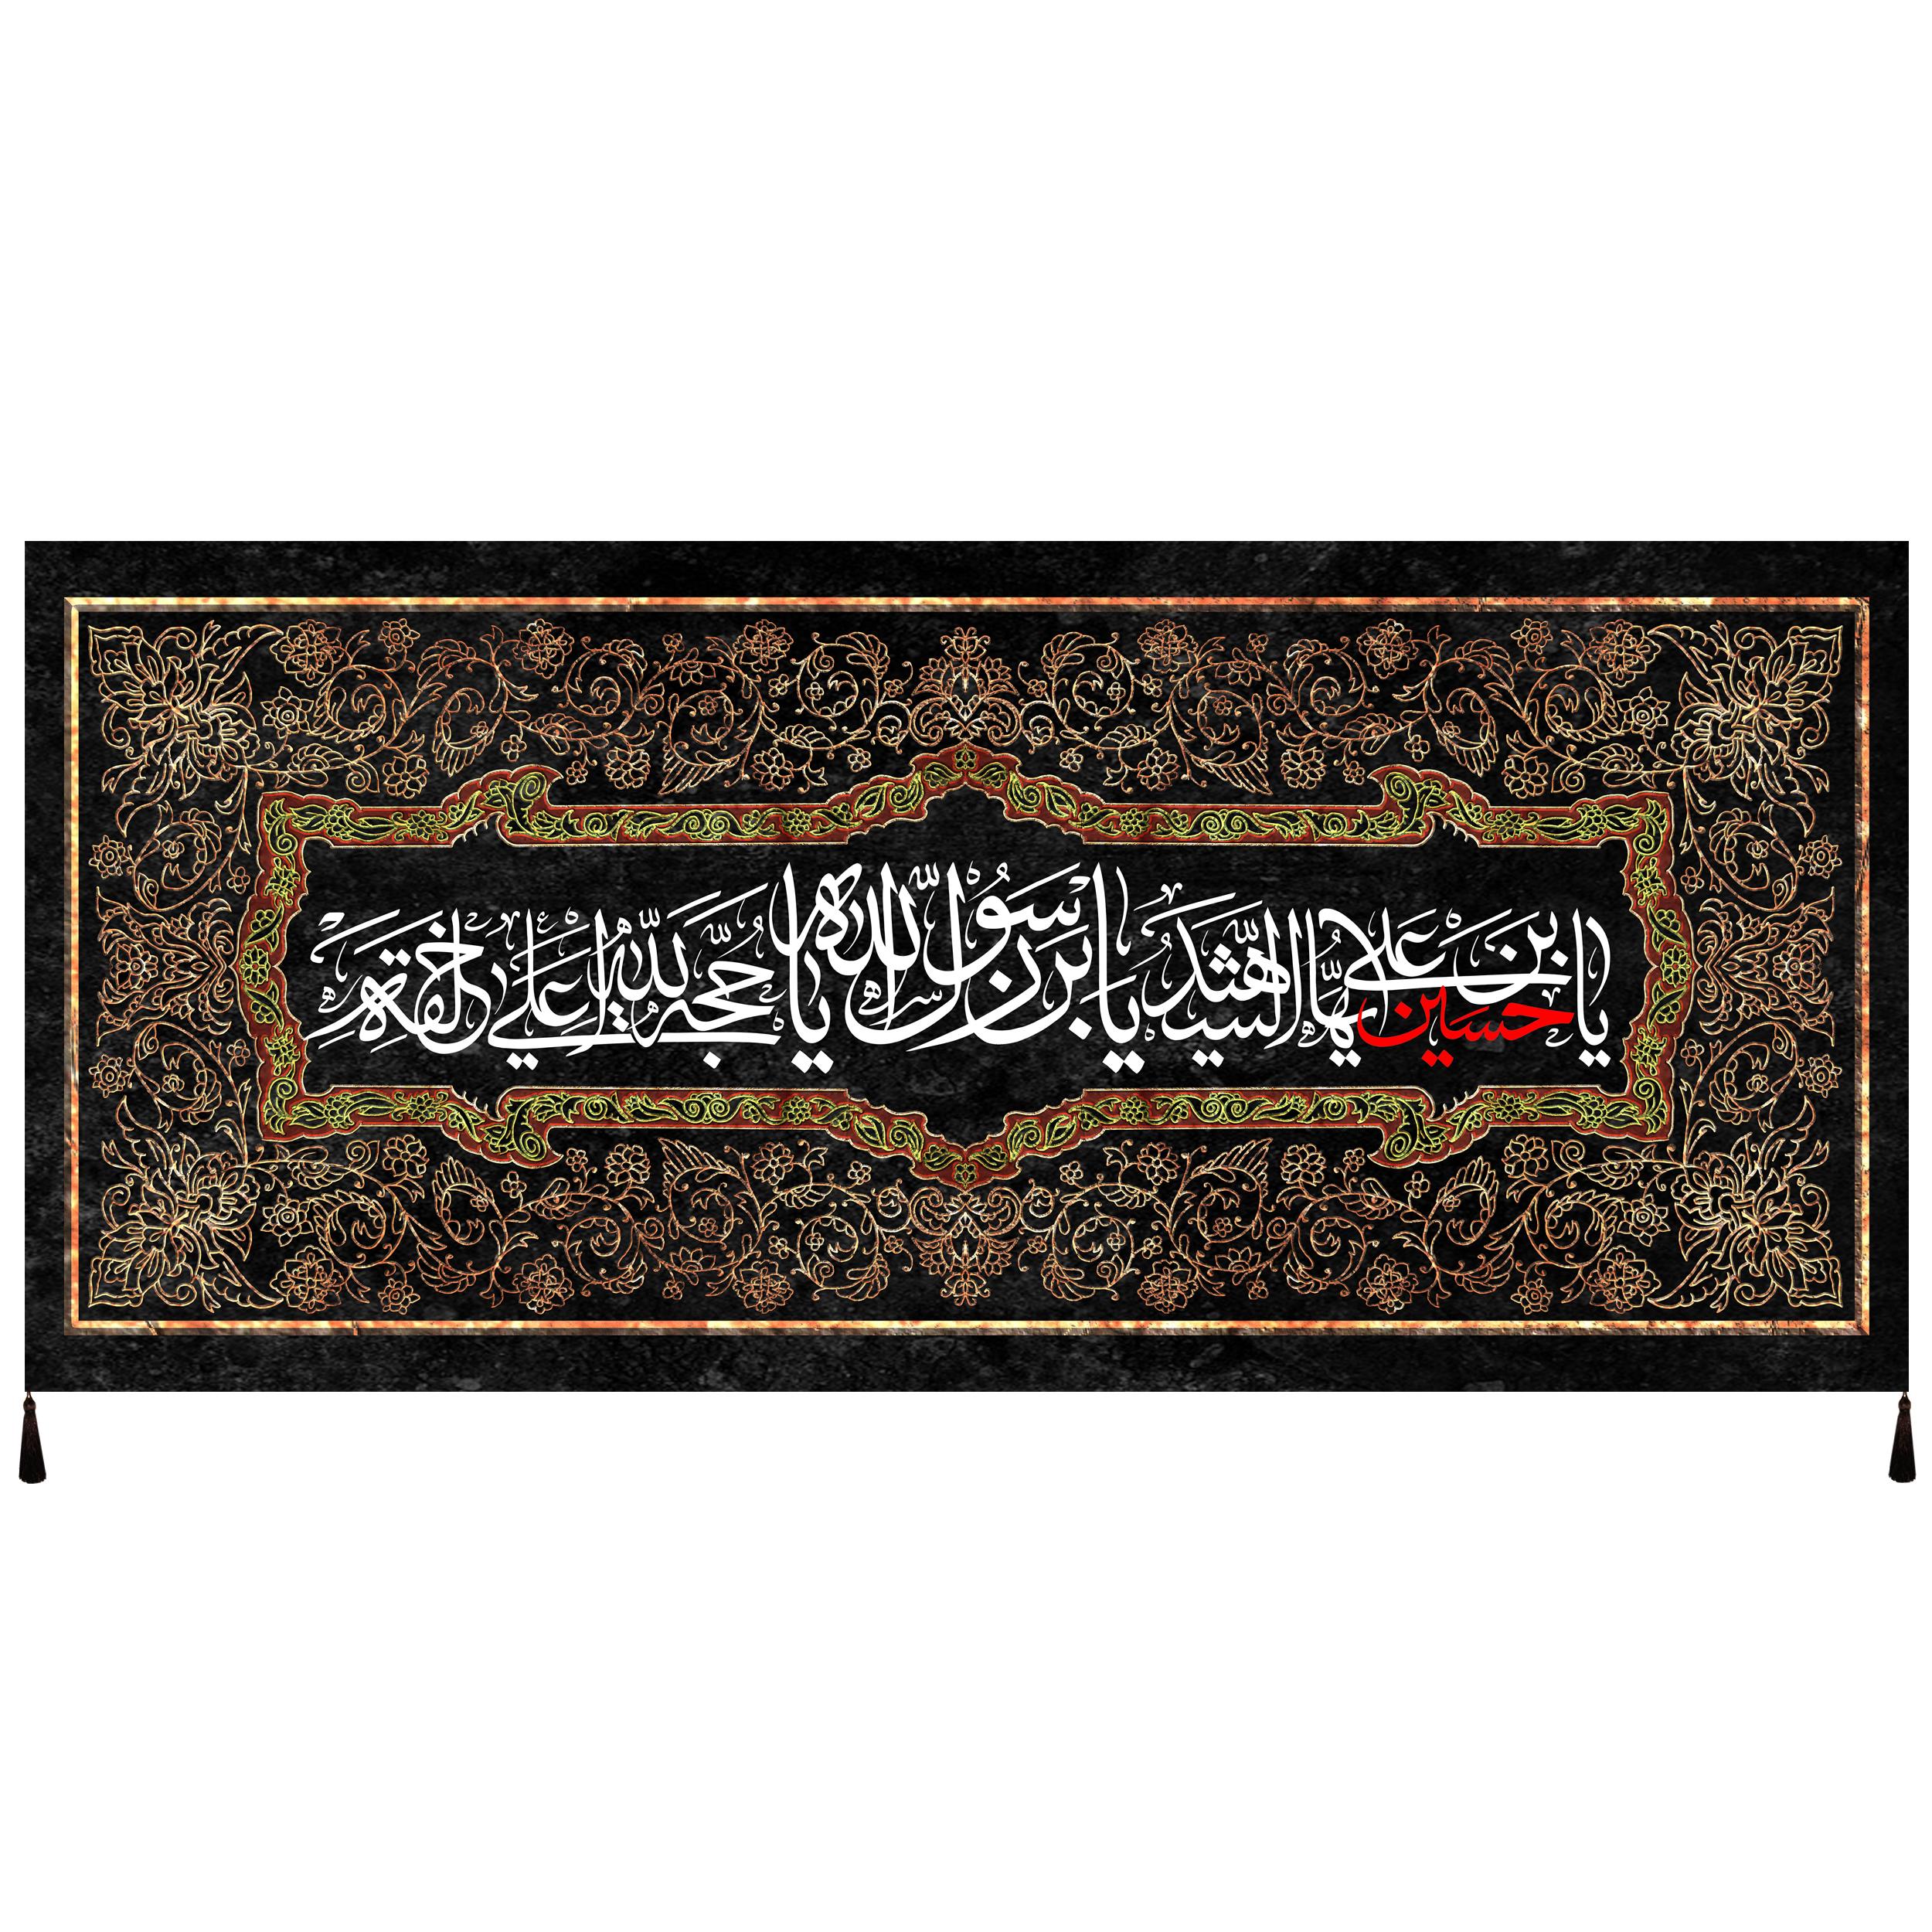 پرچم طرح امام حسین علیه السلام کد 1104